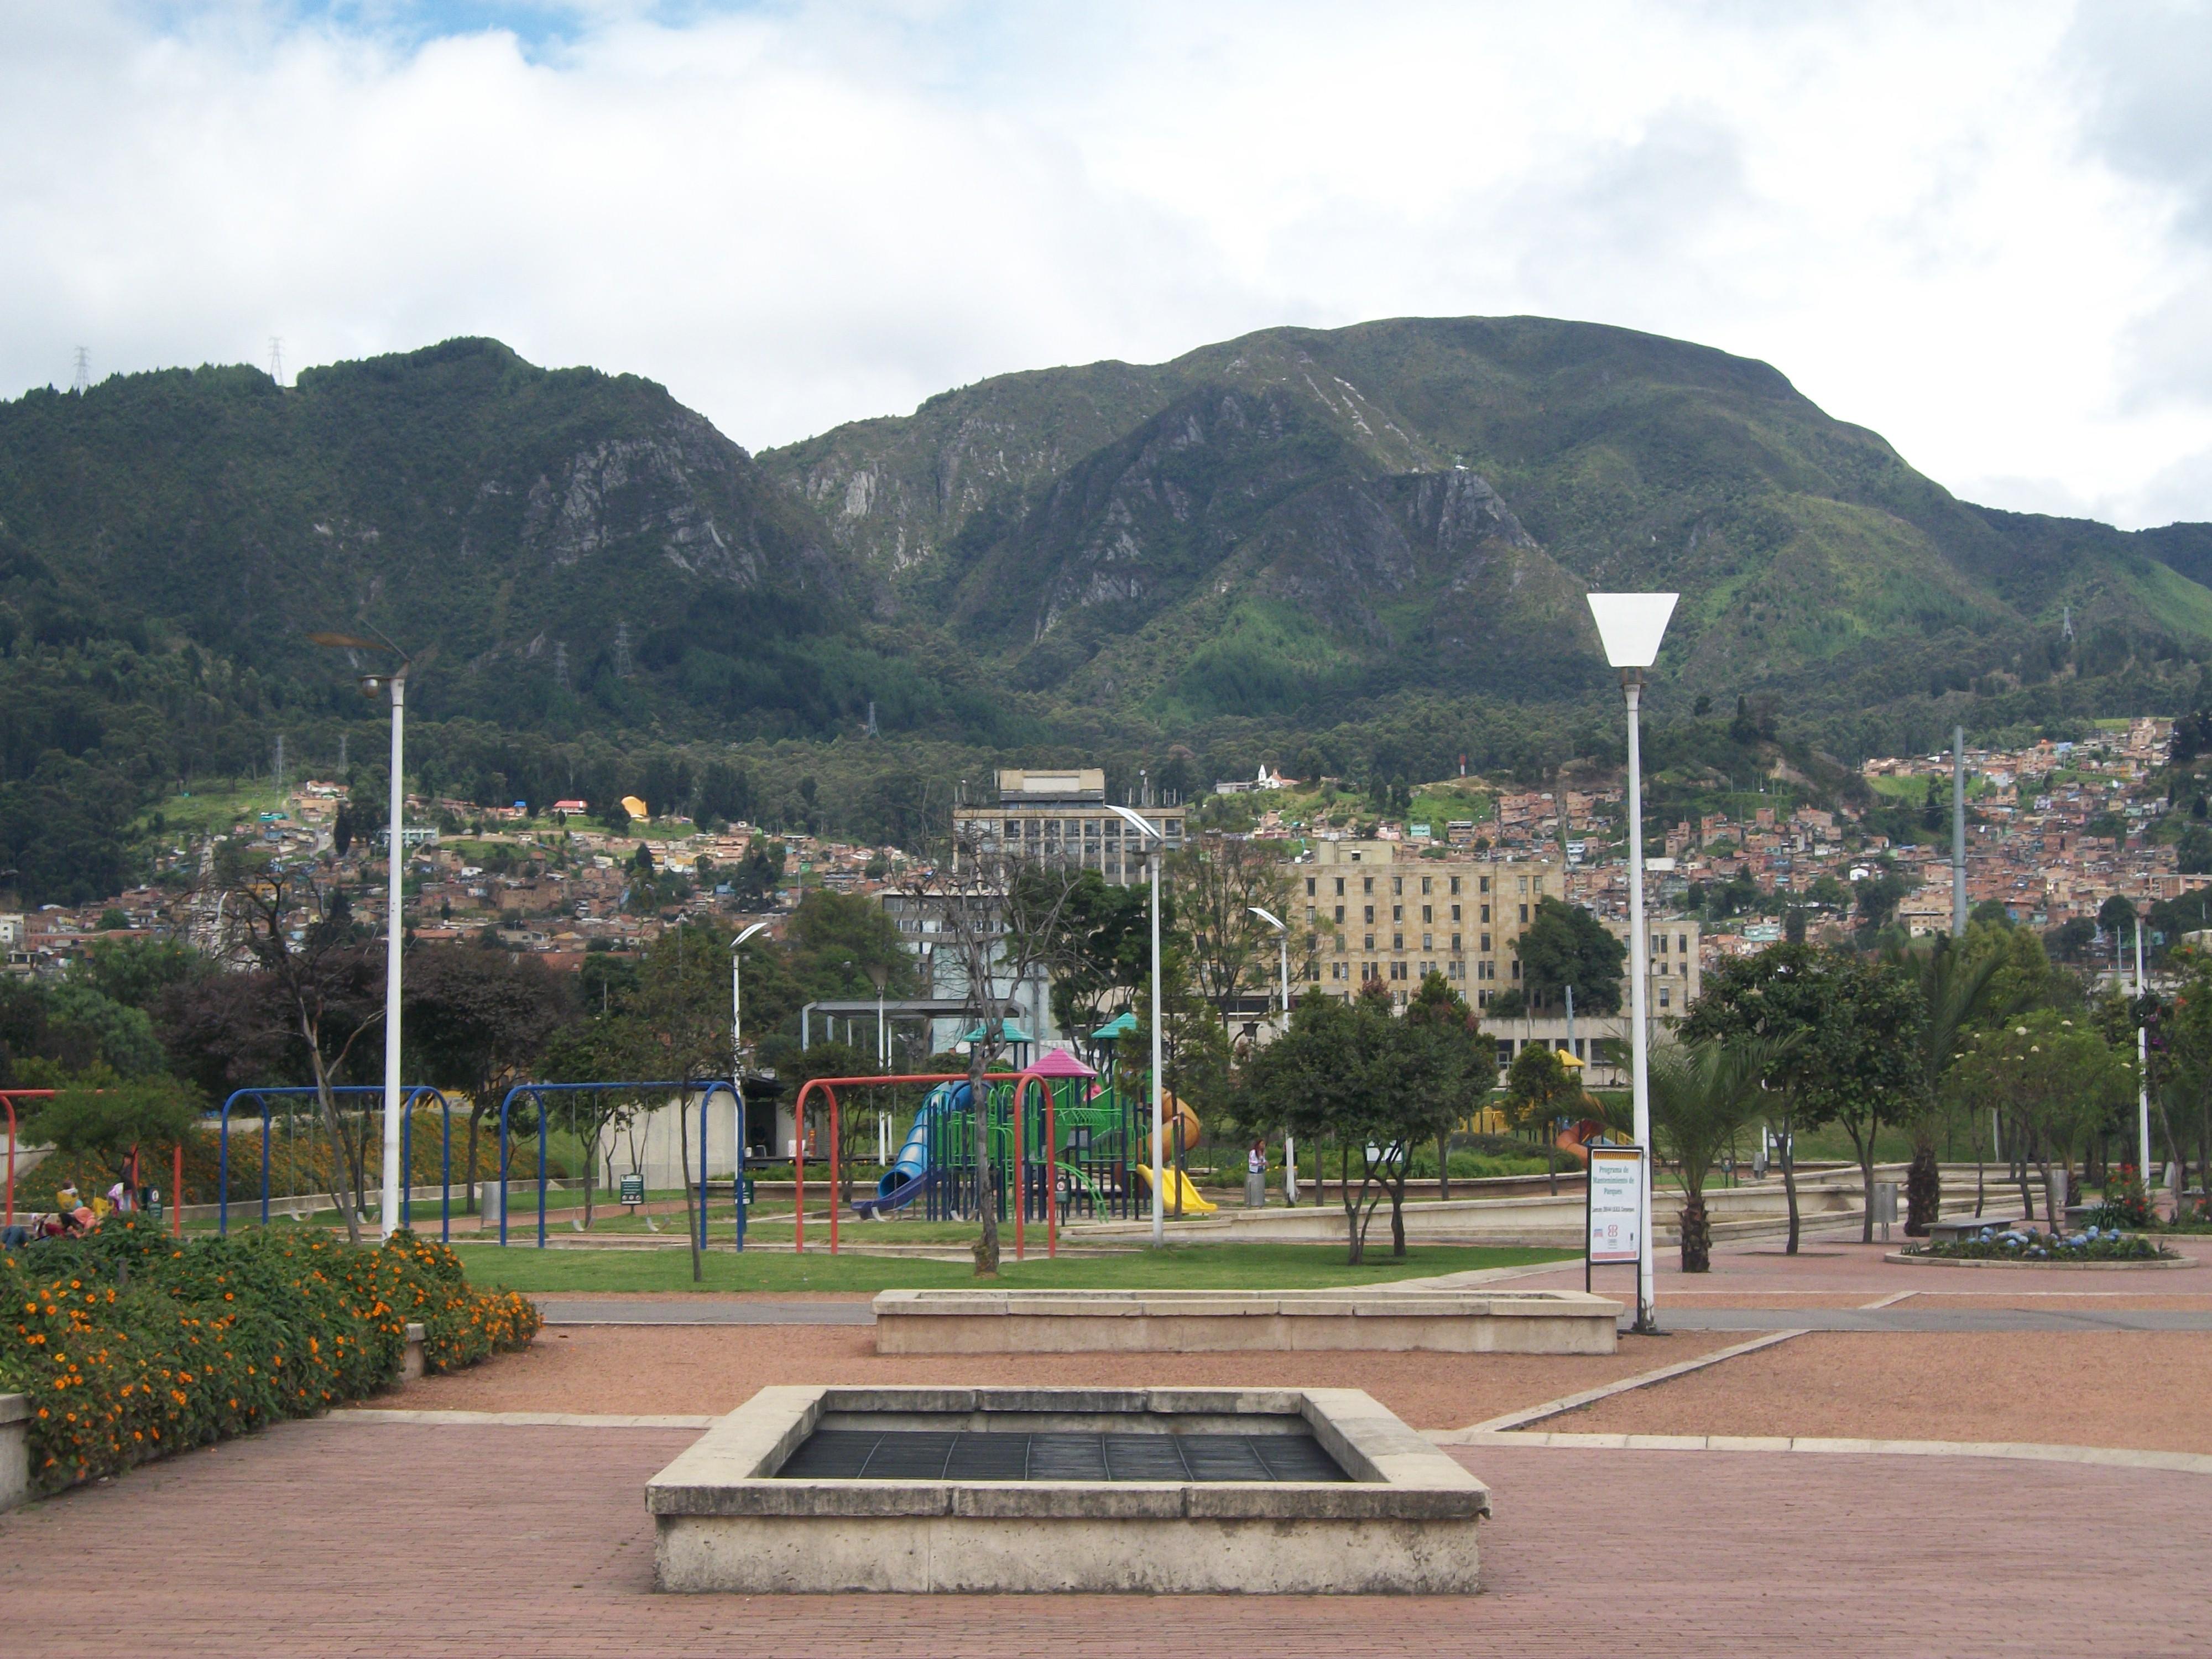 Parque Del Tercer Milenio